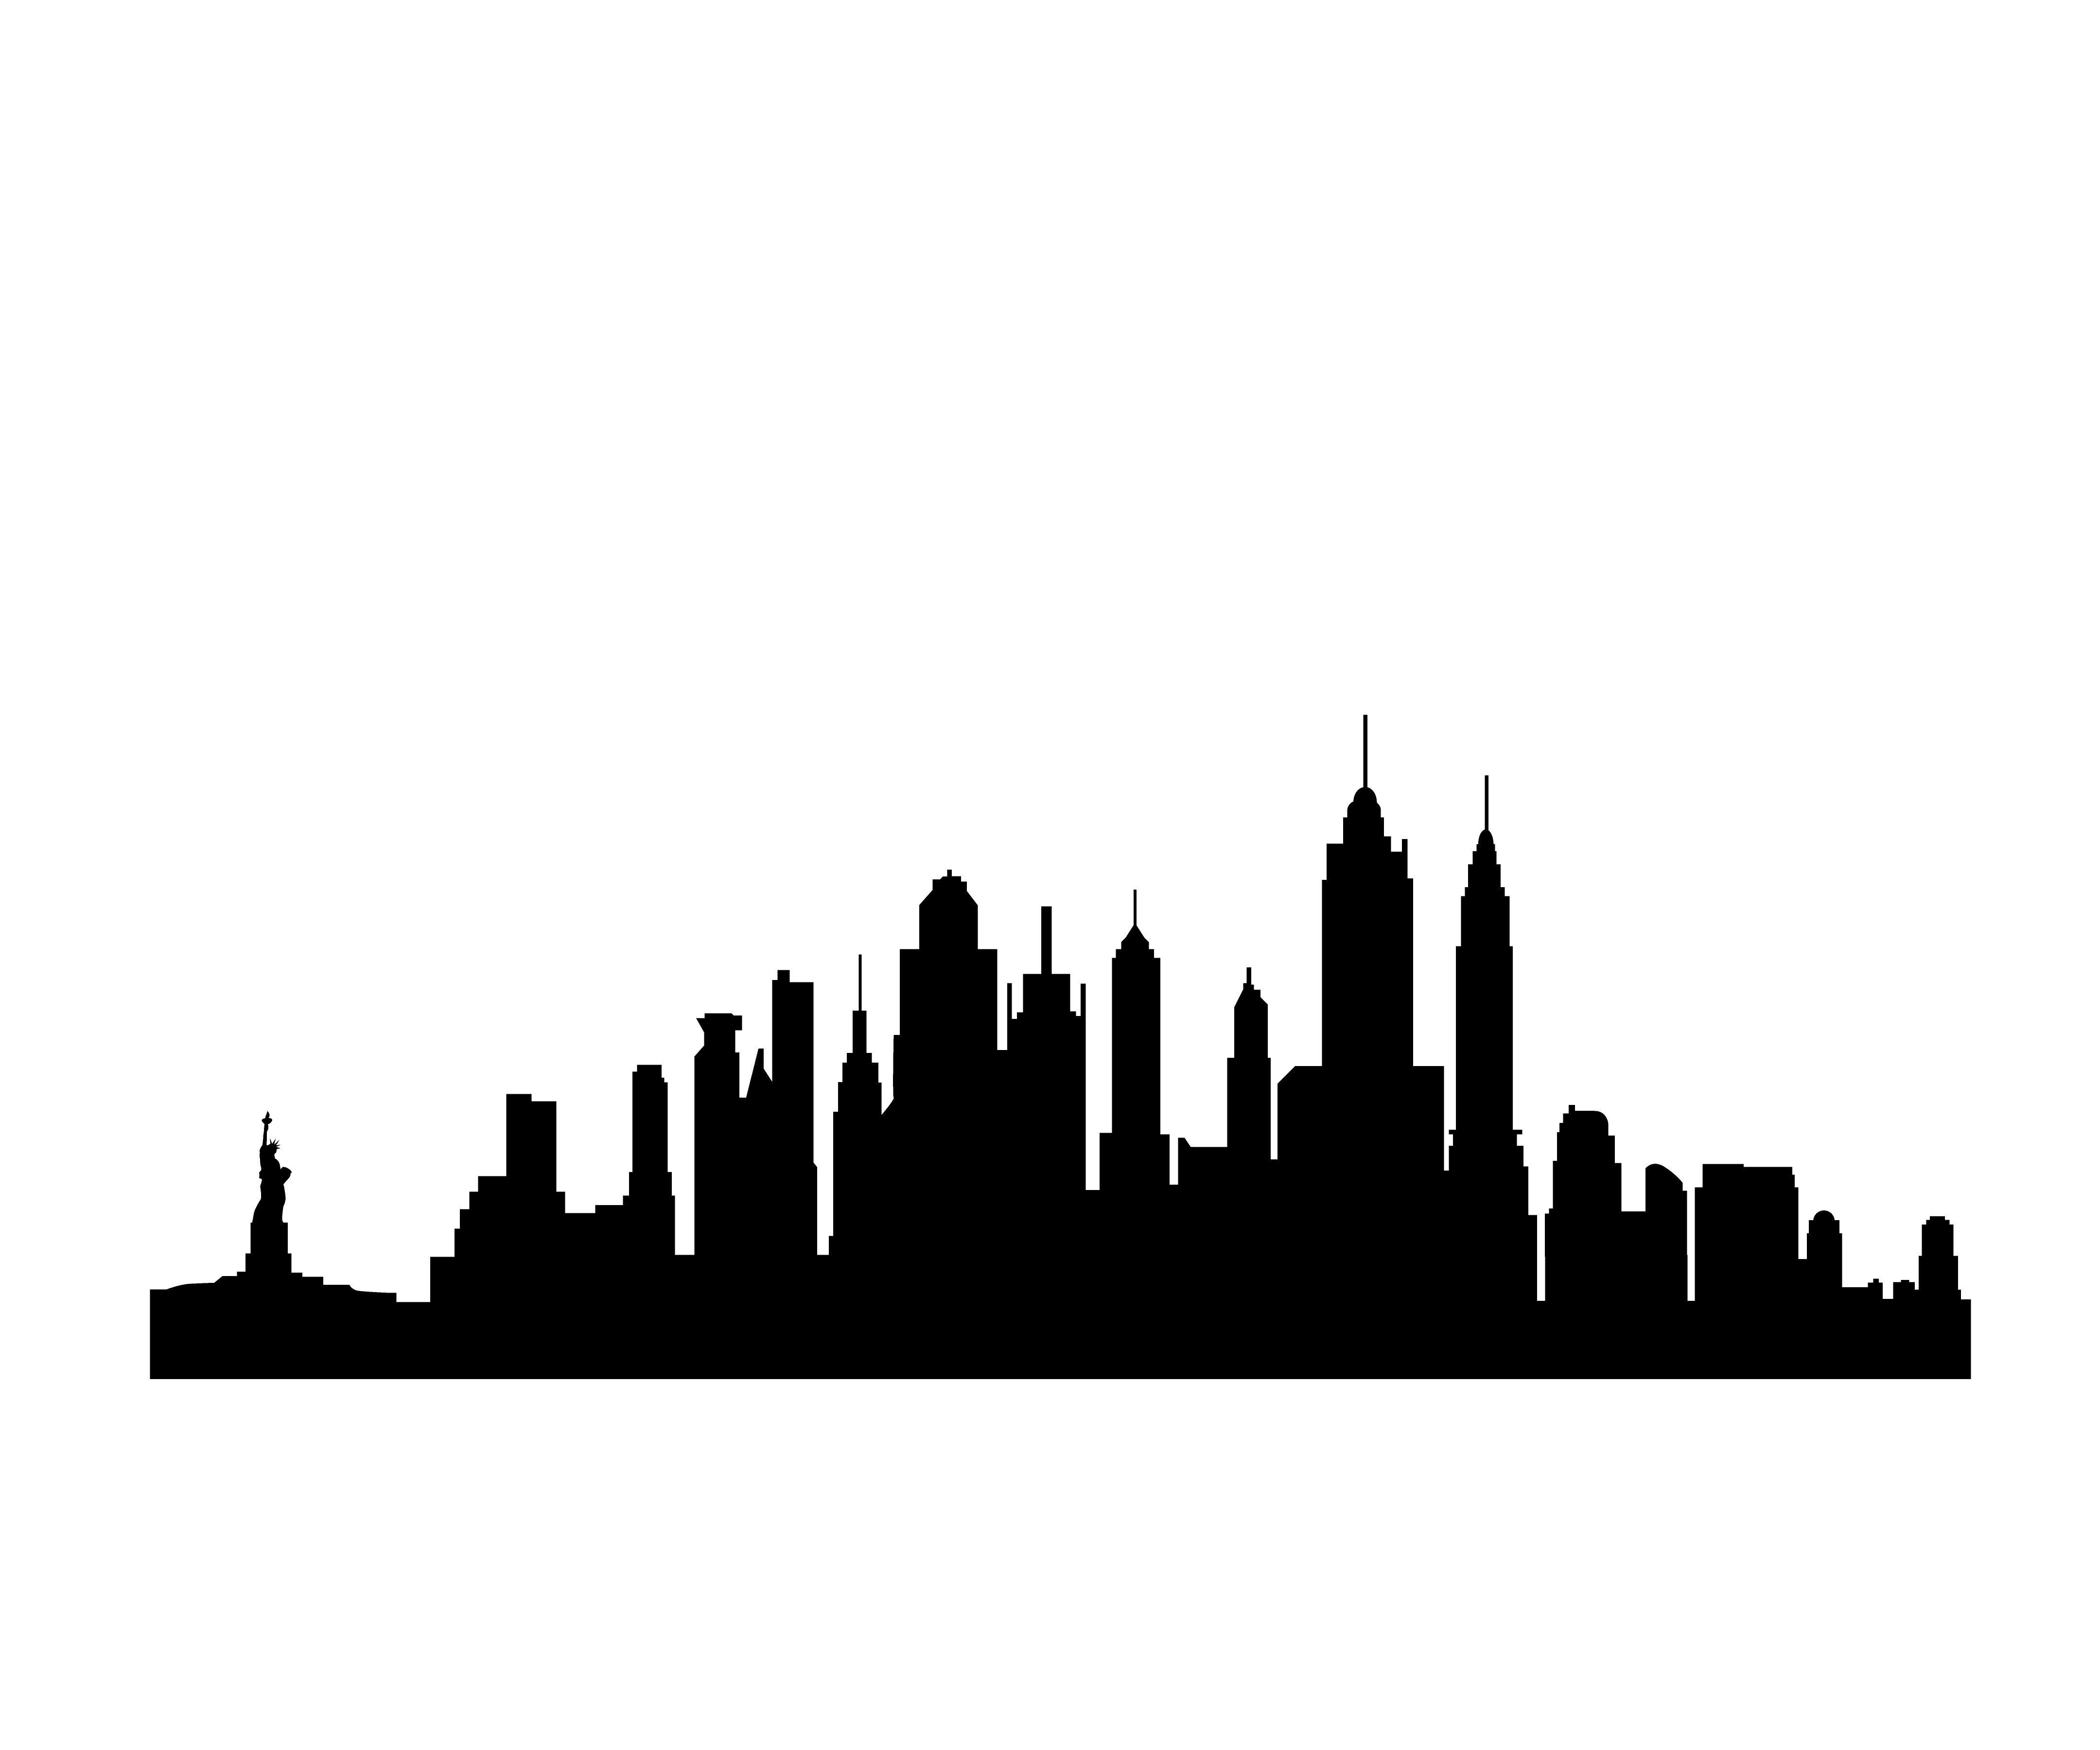 4320x3600 Skyline Silhouette